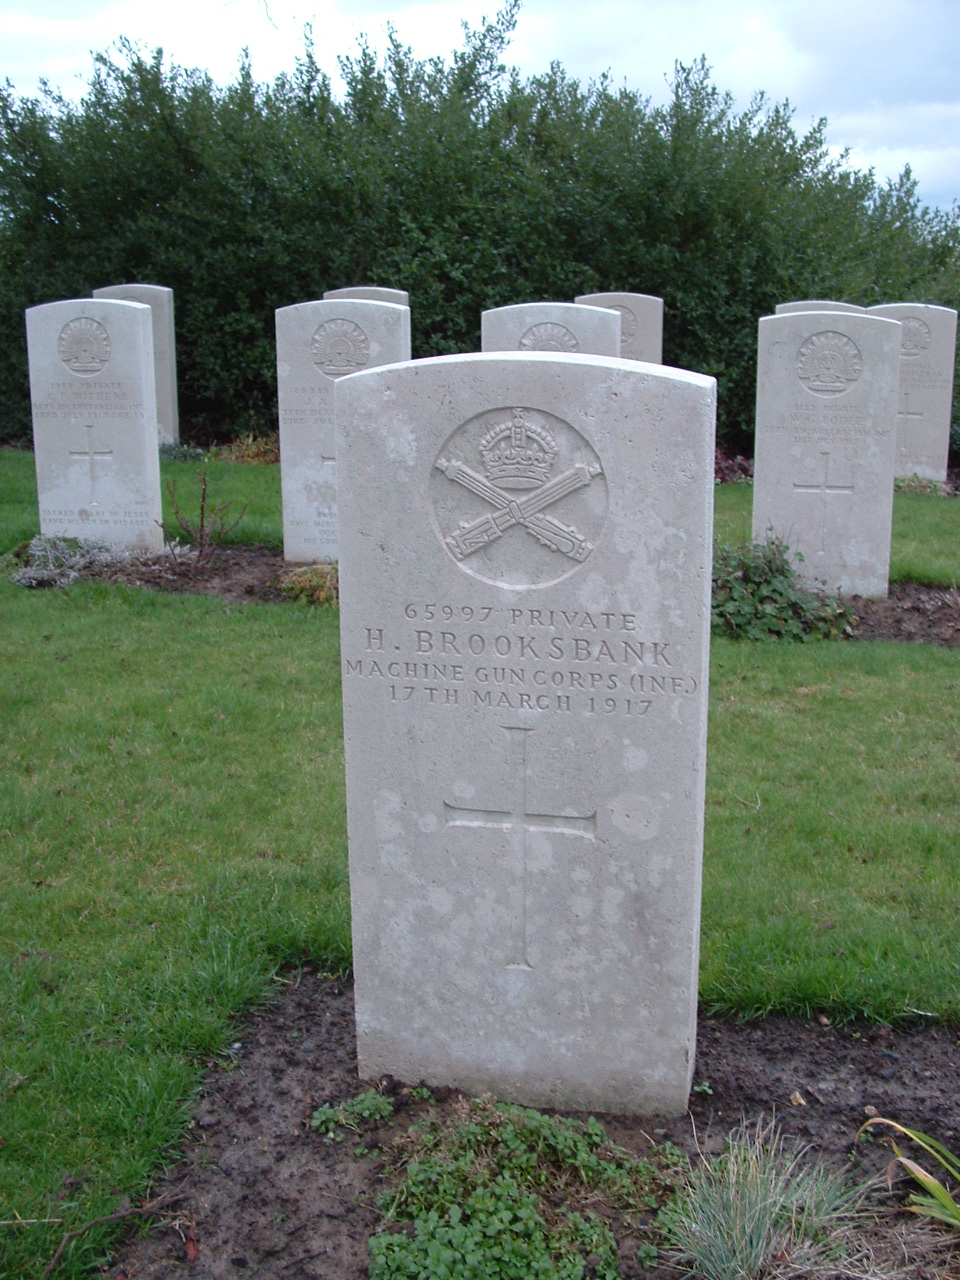 CWGC H.Brooksbank headstone